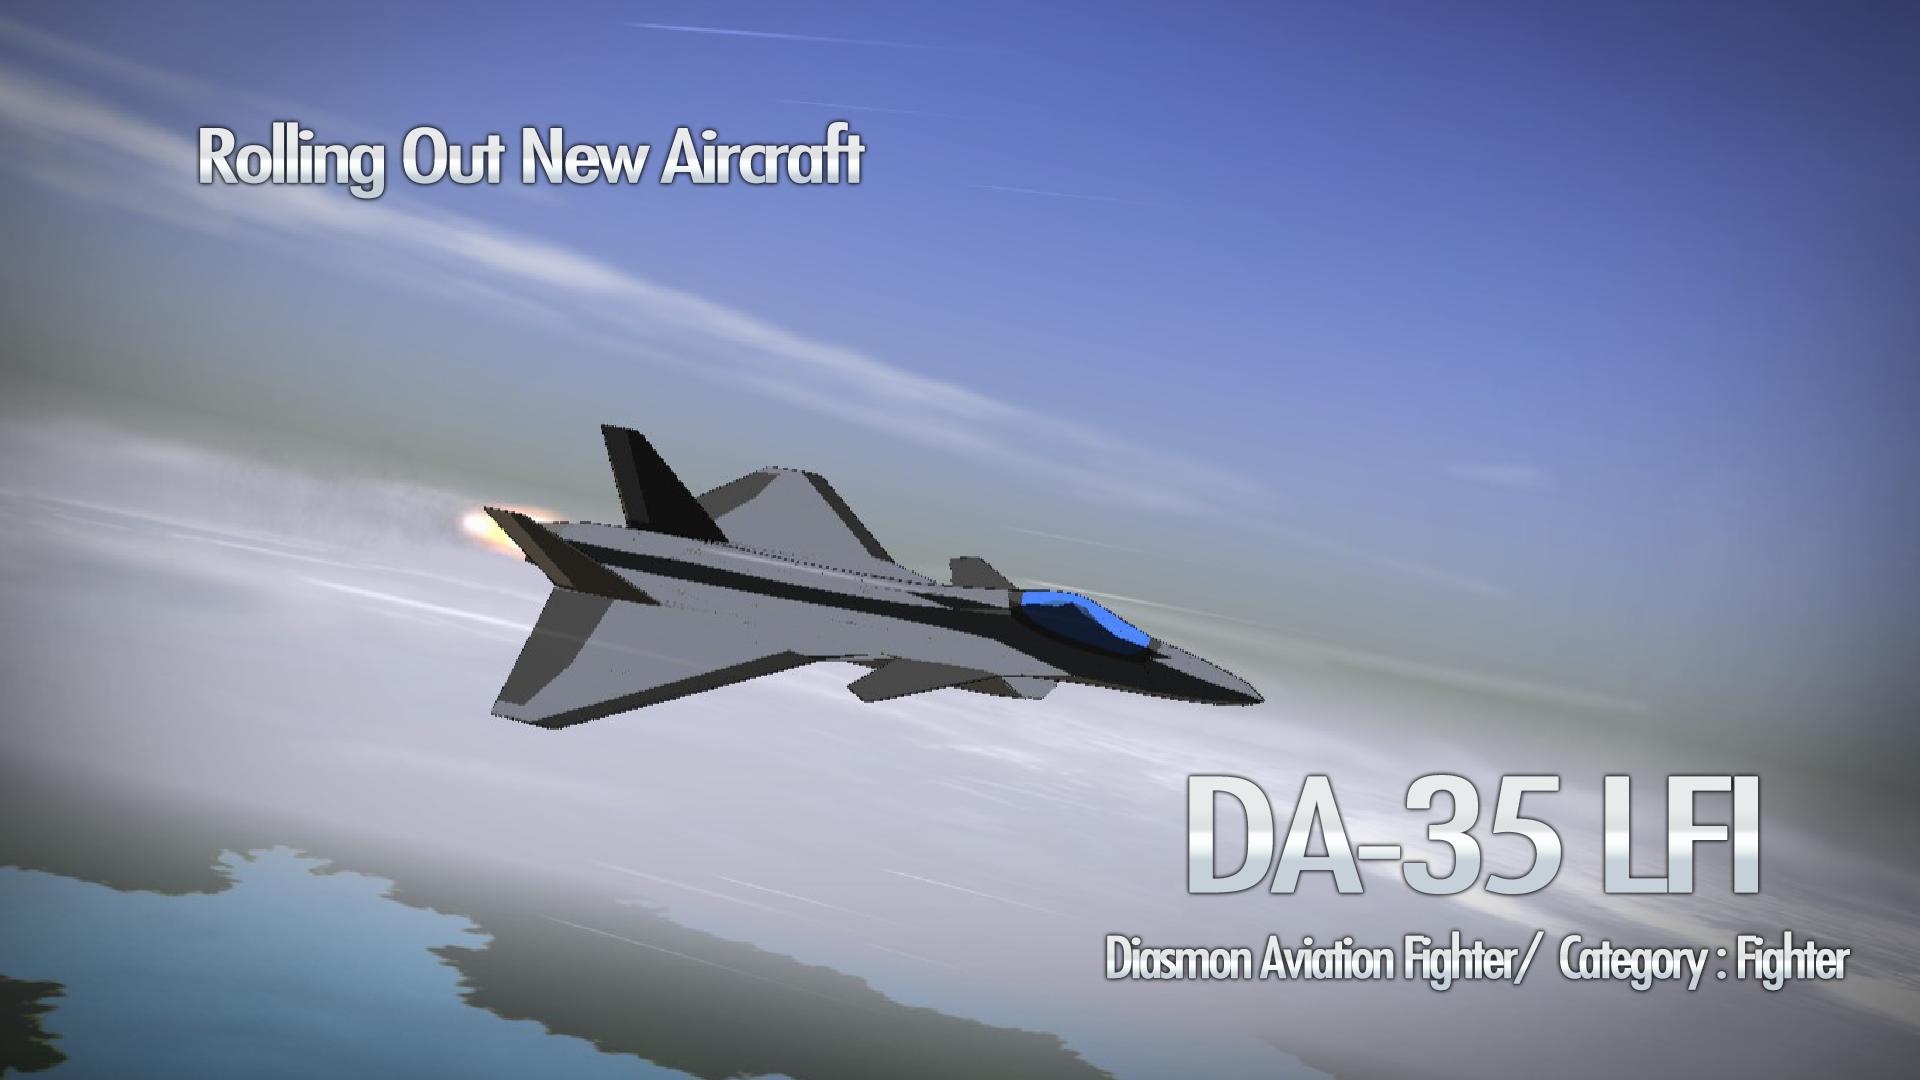 DA 35